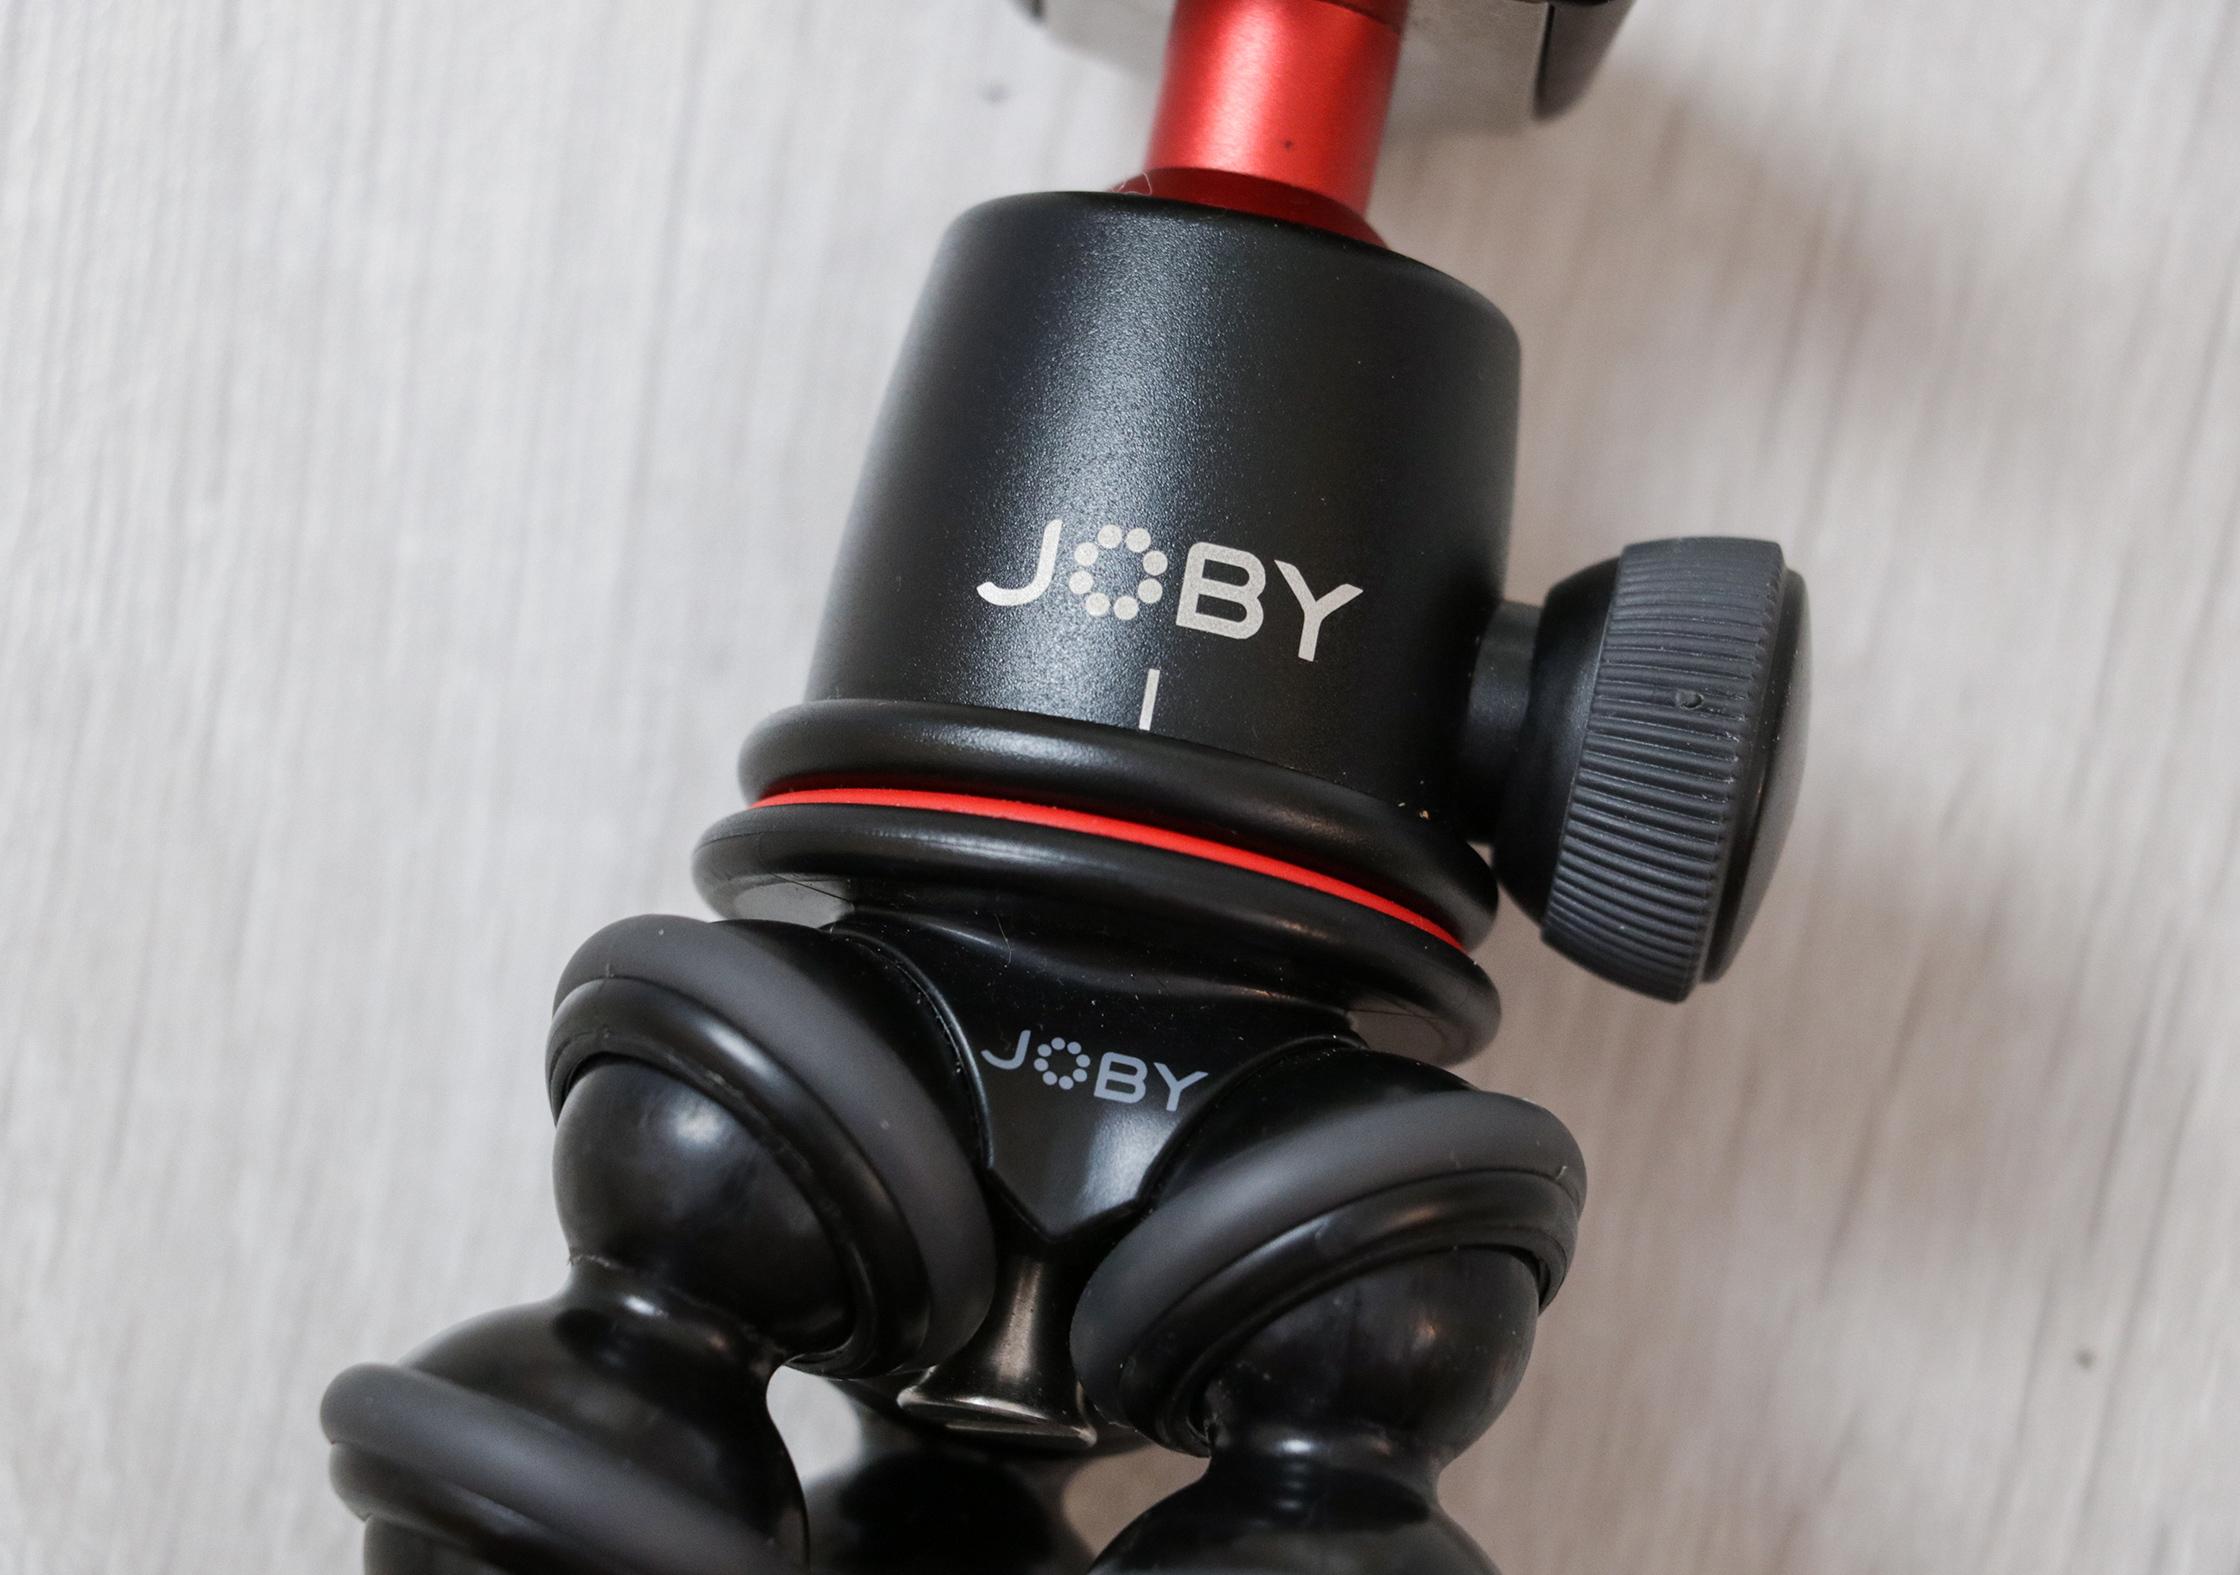 JOBY GorillaPod Branding